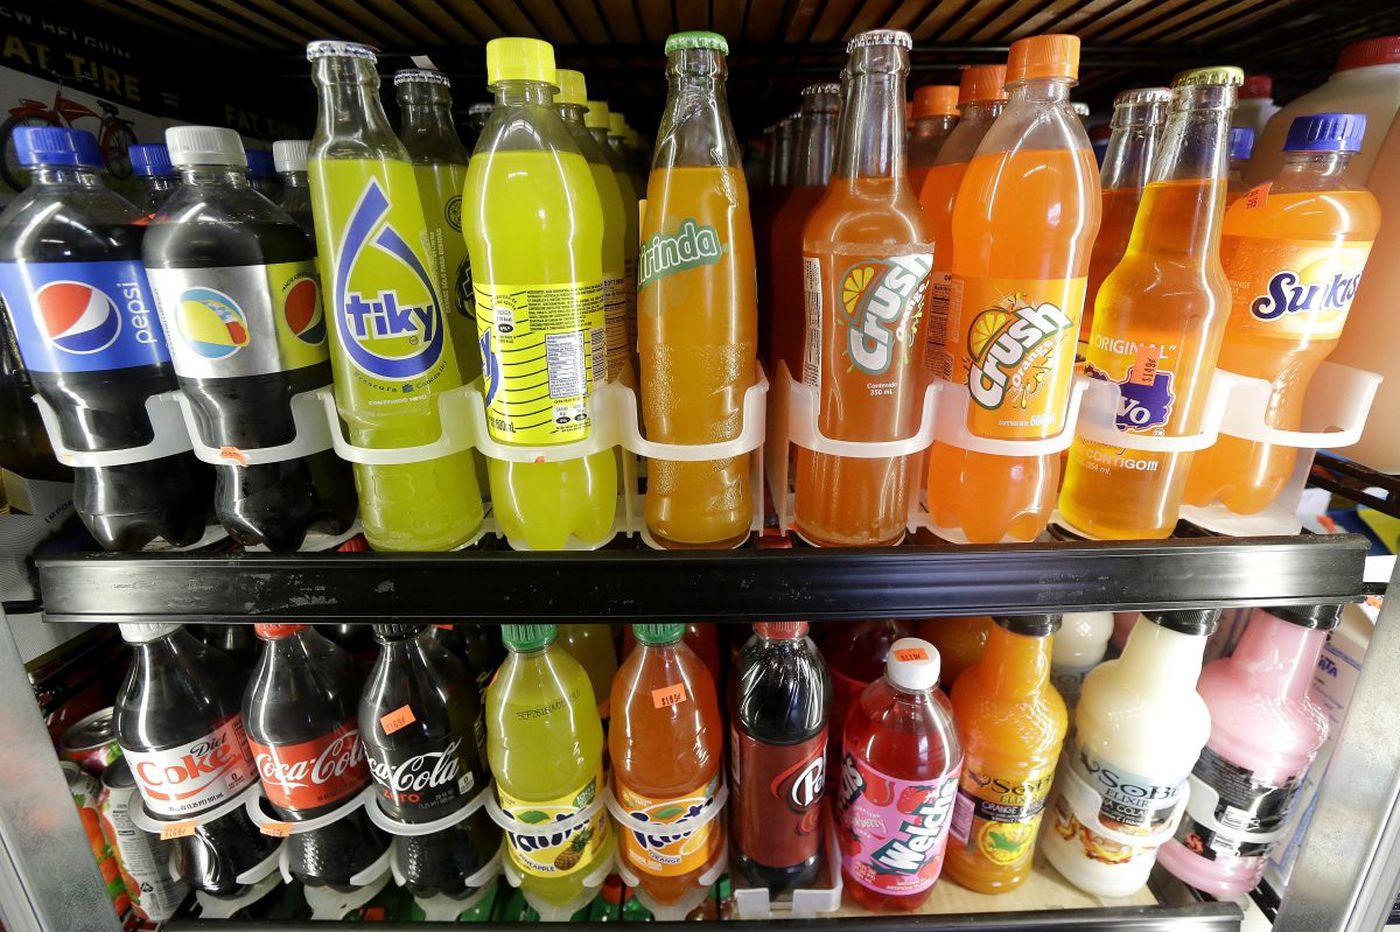 Philadelphia soda tax does more harm than good | Opinion